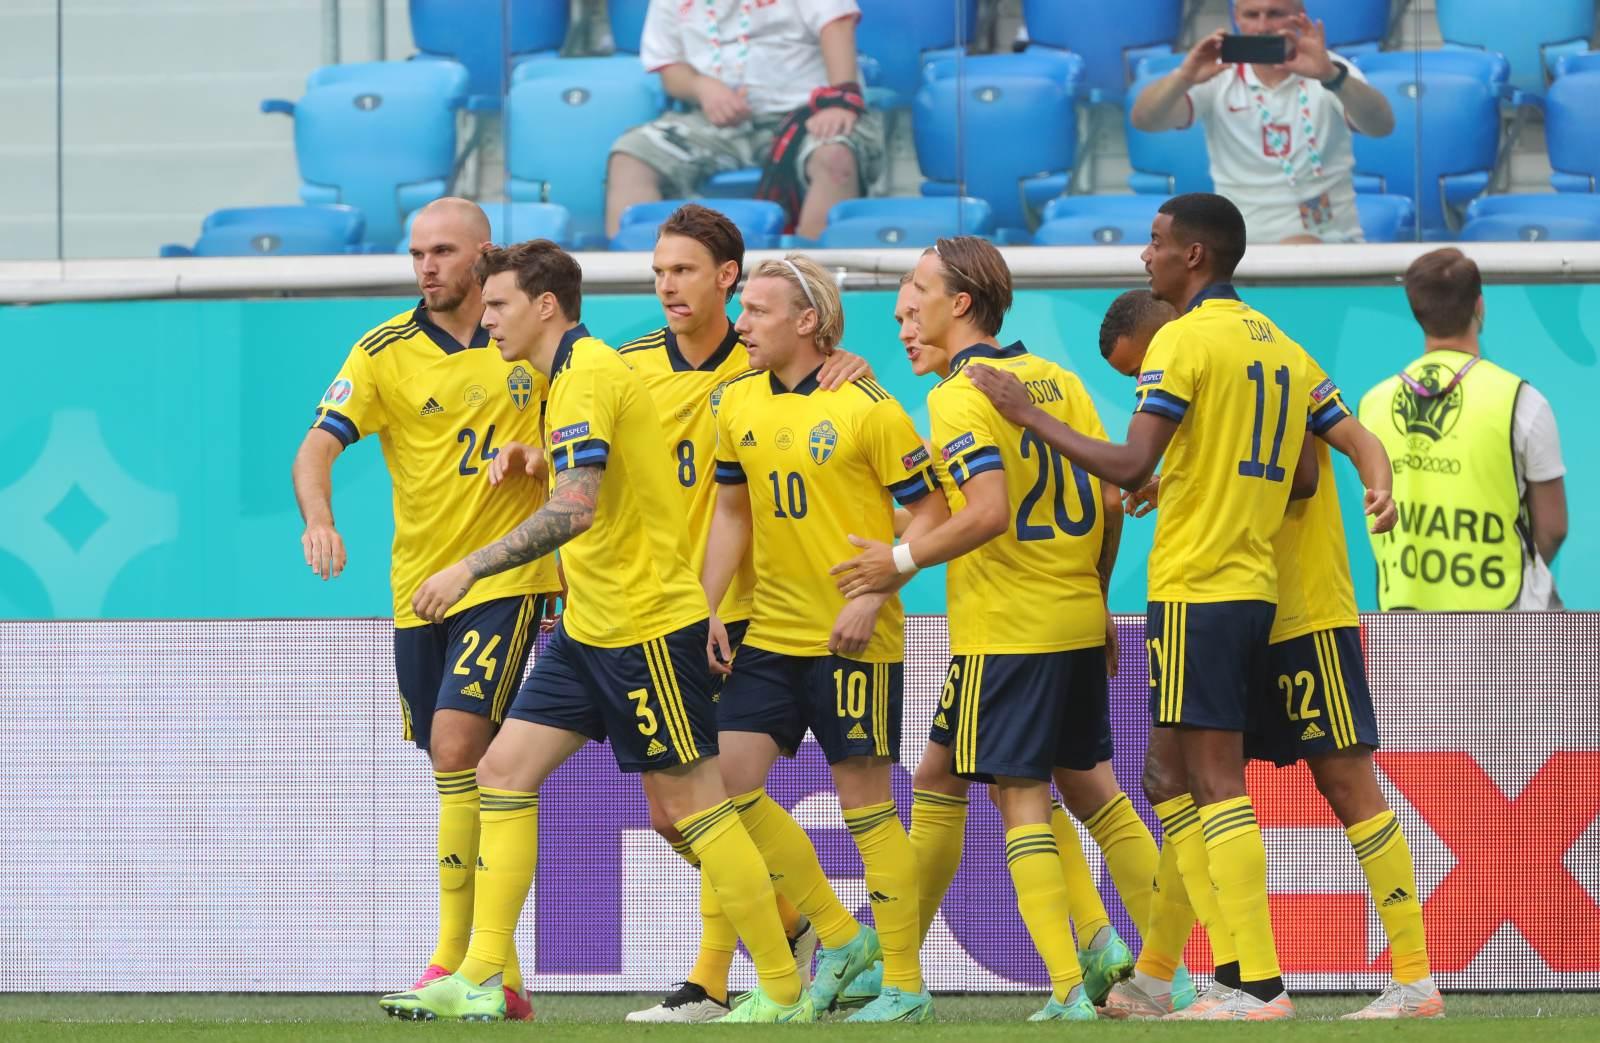 Швеция – Косово: прогноз на матч отборочного цикла чемпионата мира-2022 - 9 октября 2021